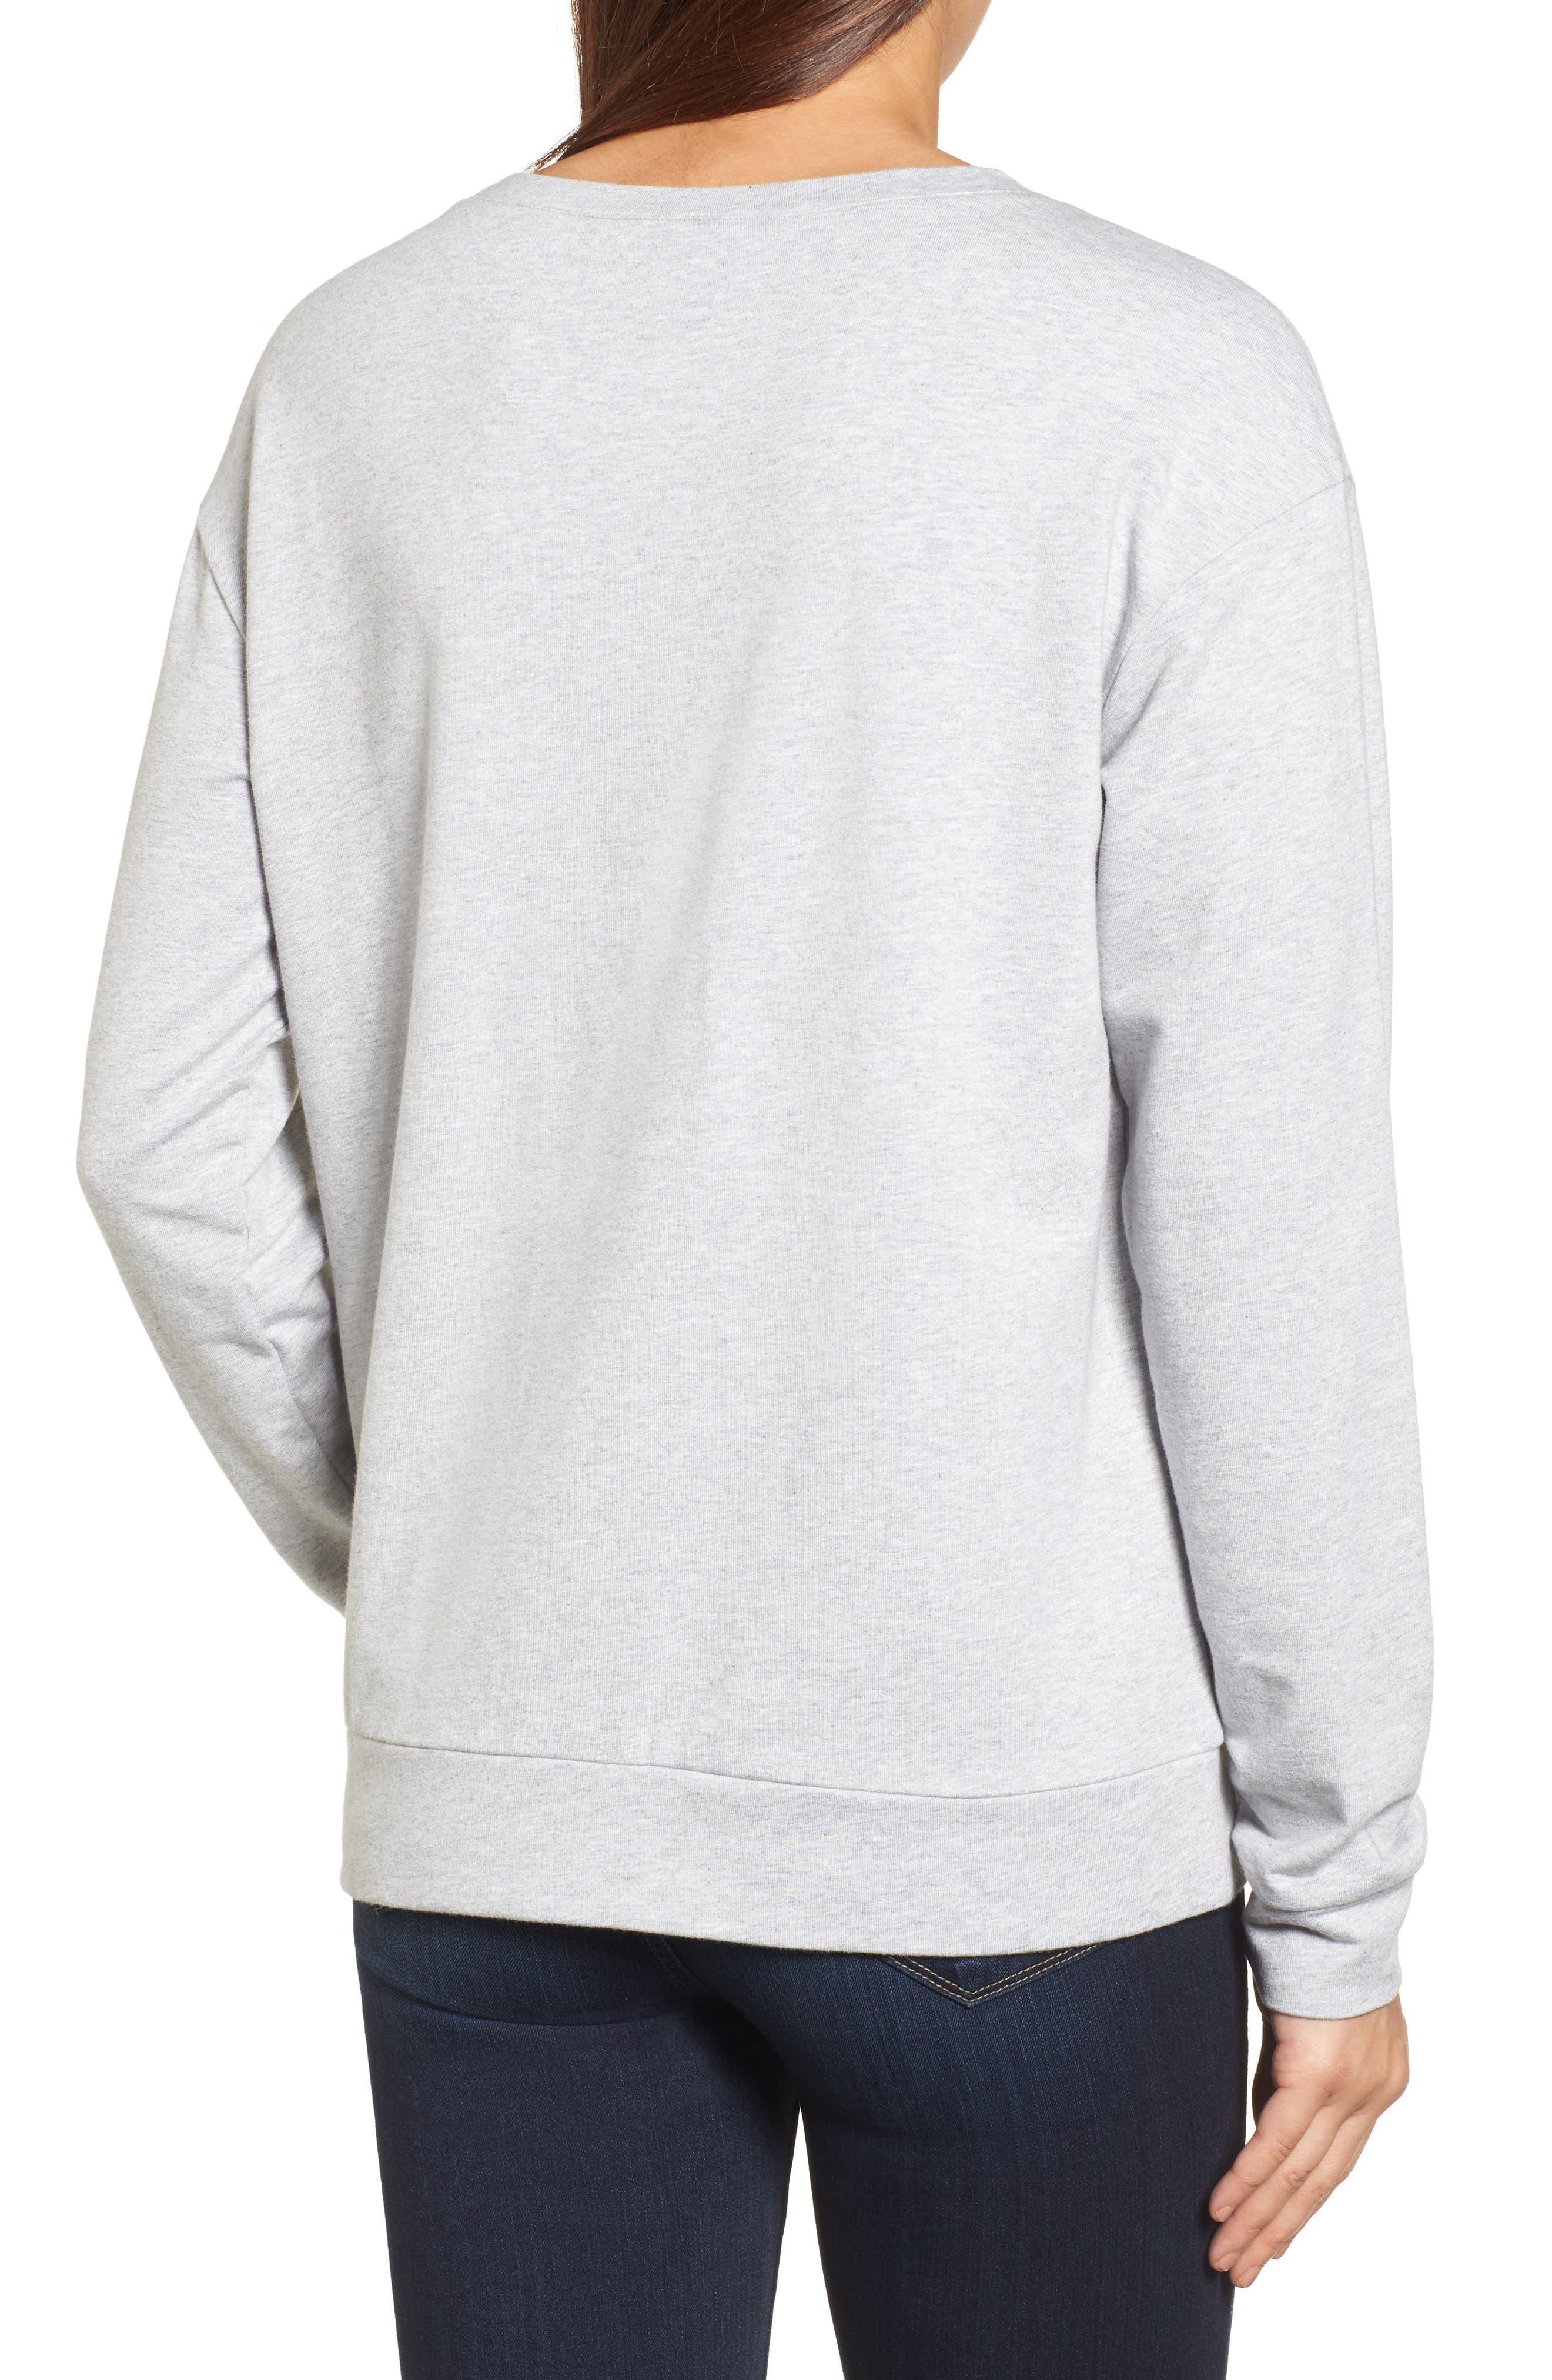 Embellished Sweatshirt,                             Alternate thumbnail 3, color,                             Grey Heather